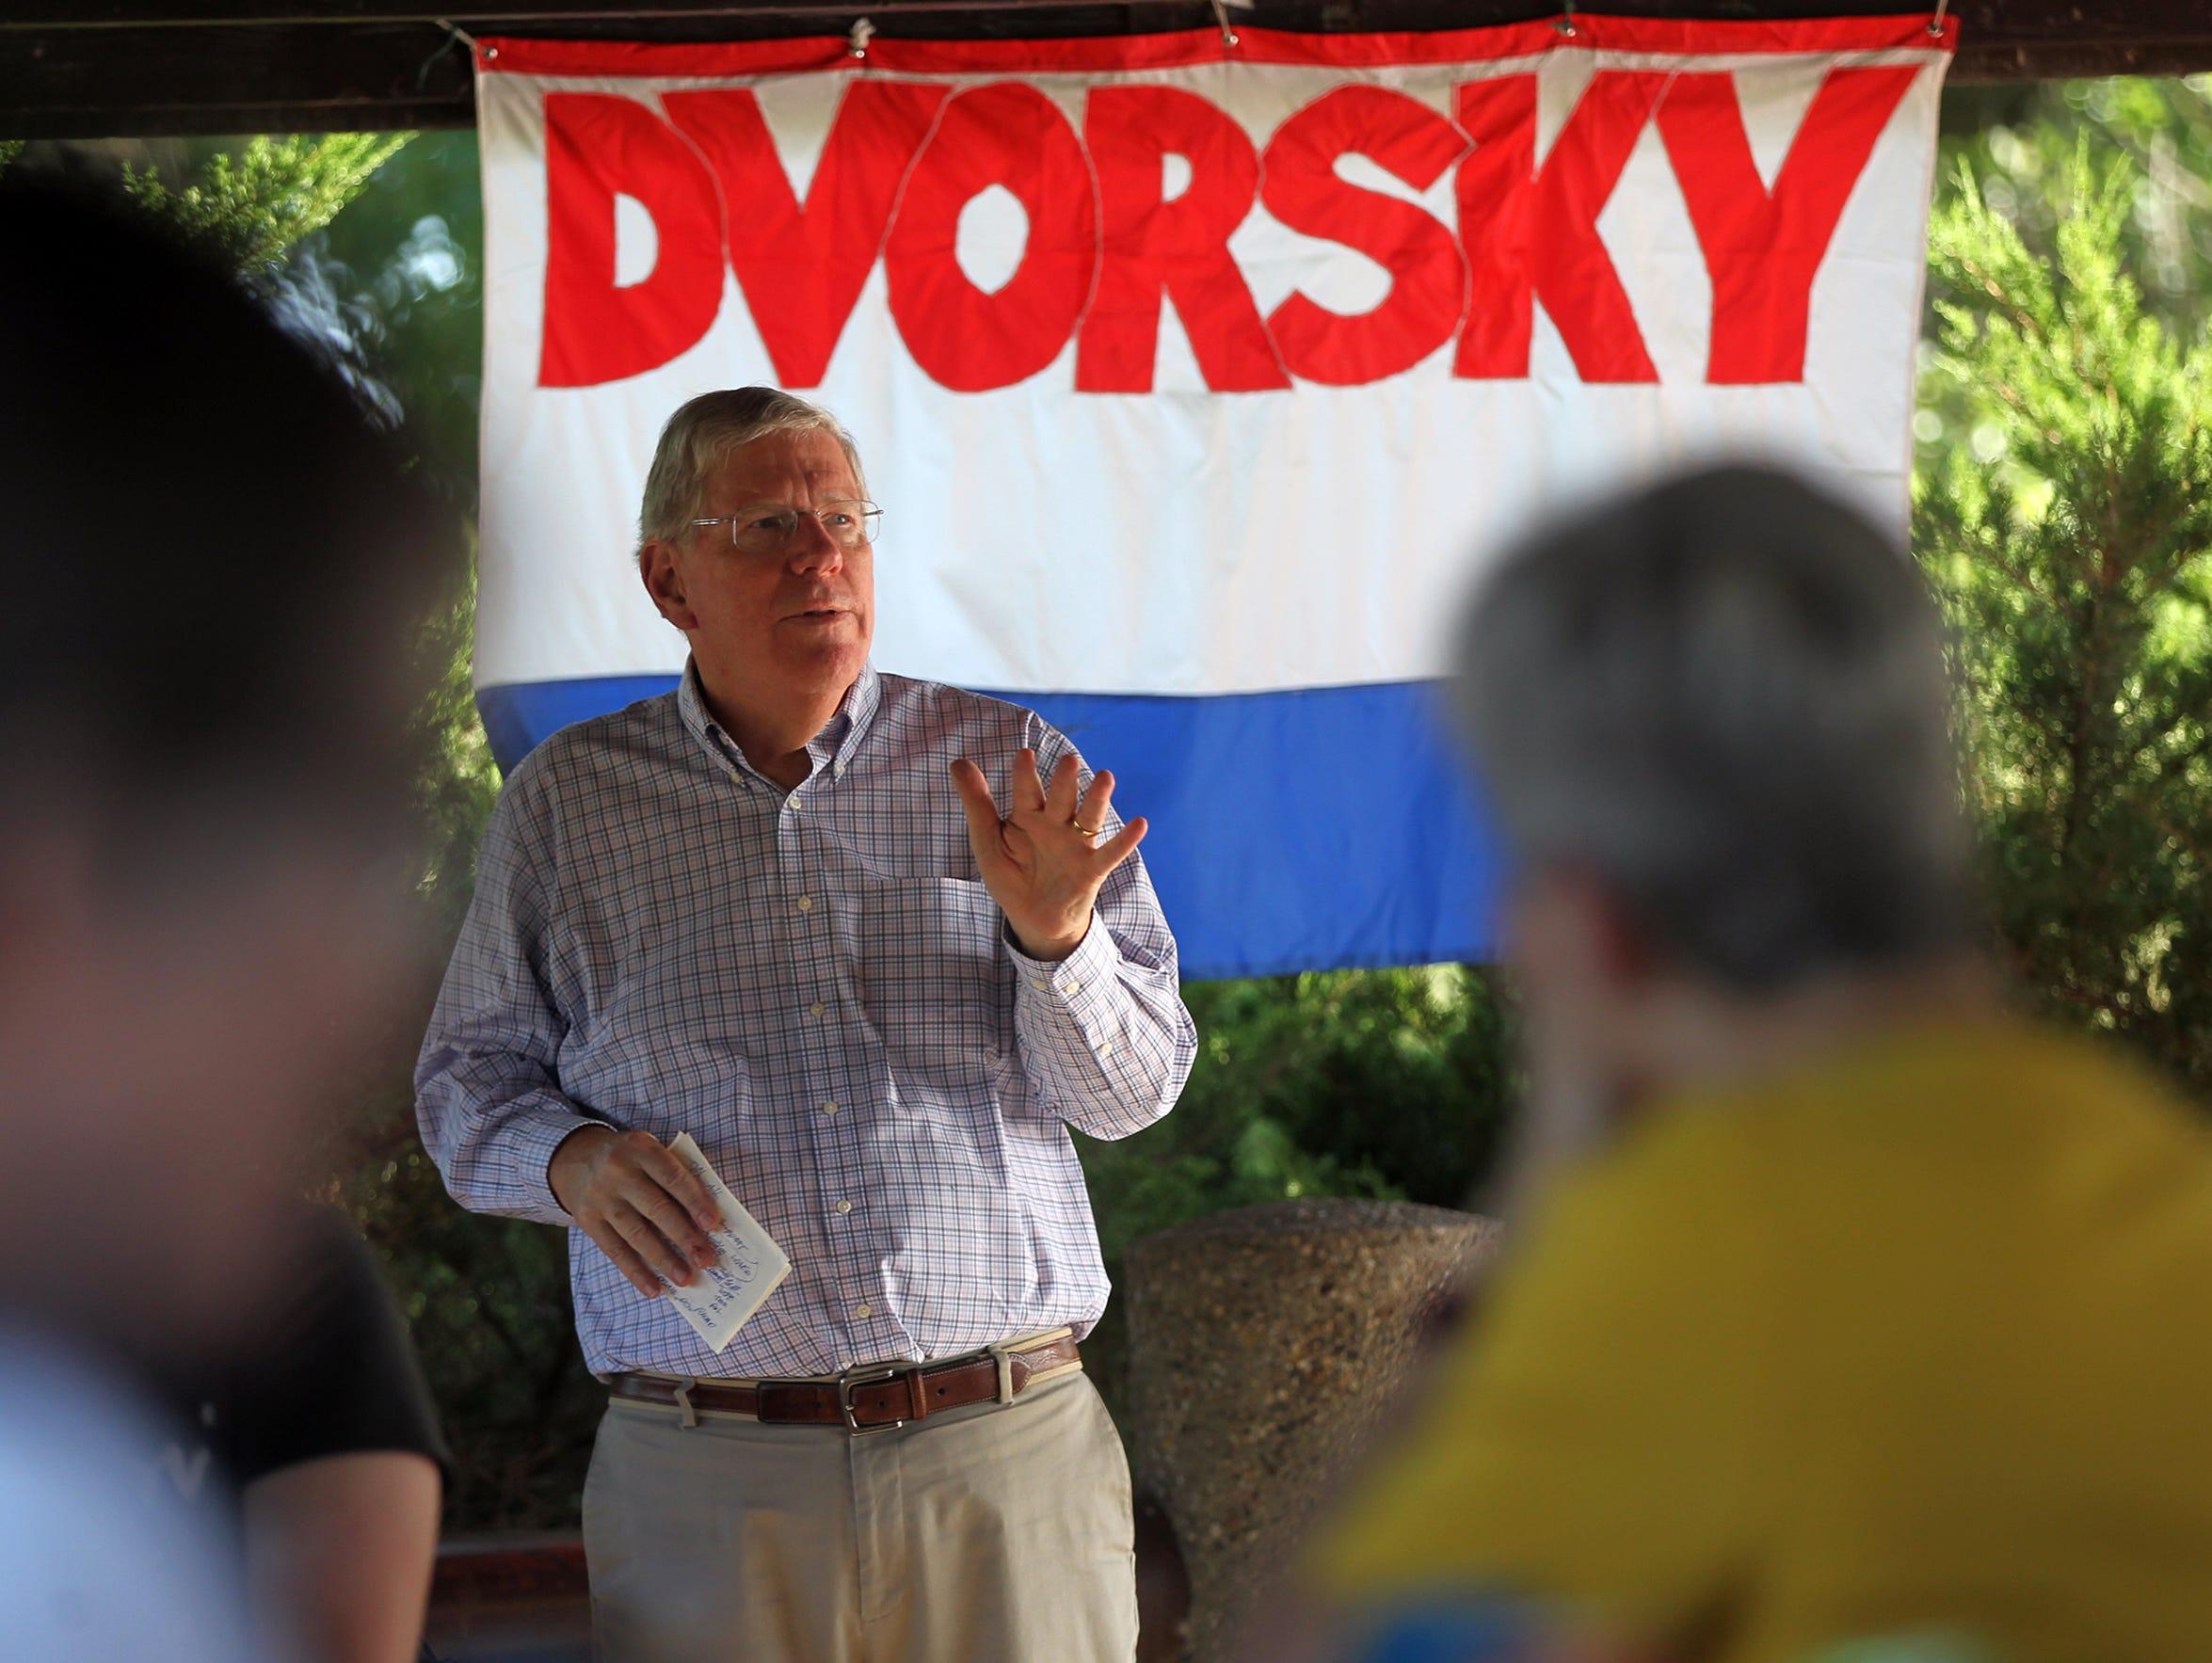 Sen. Bob Dvorsky (D-Coralville) thanks friends and